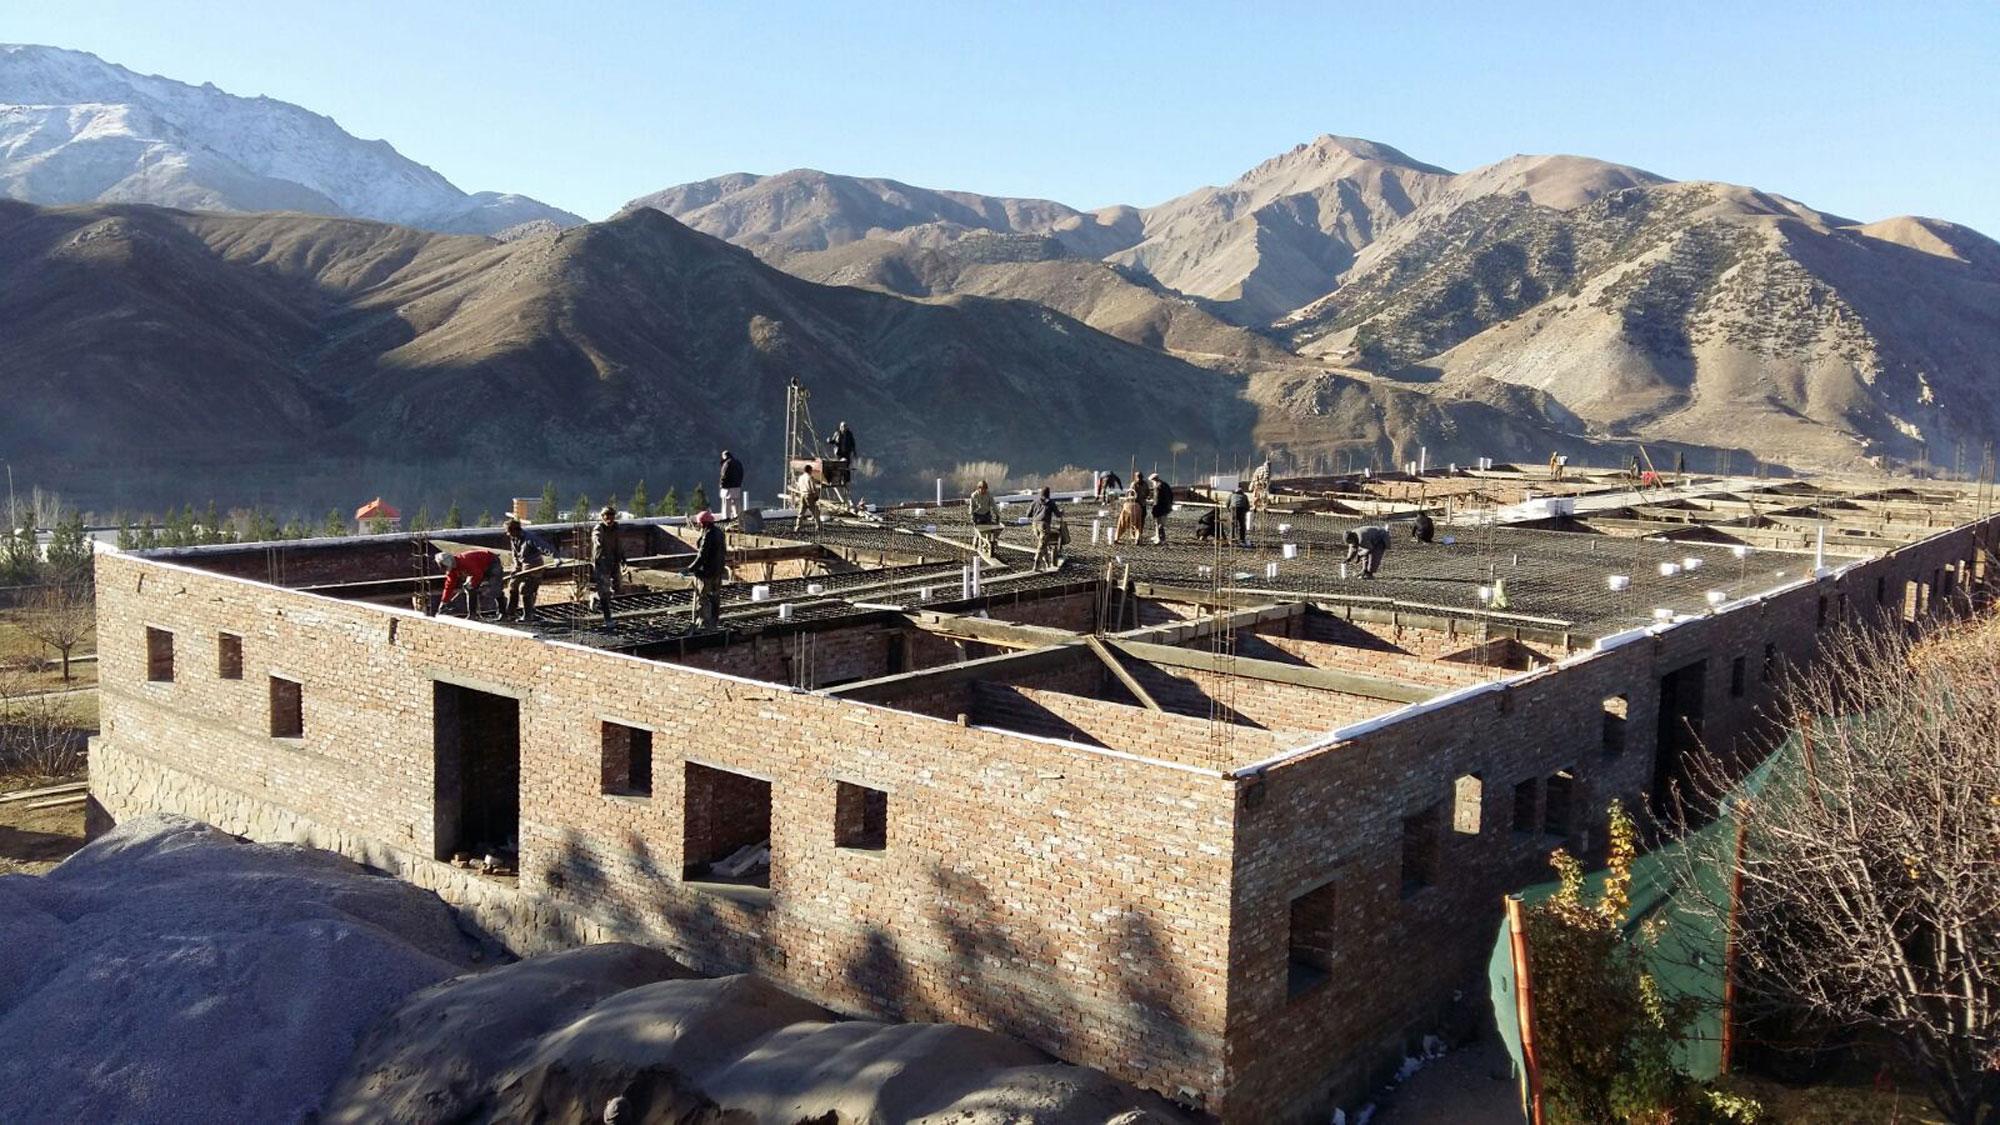 Panjshir, per gentile concessione di Emergency